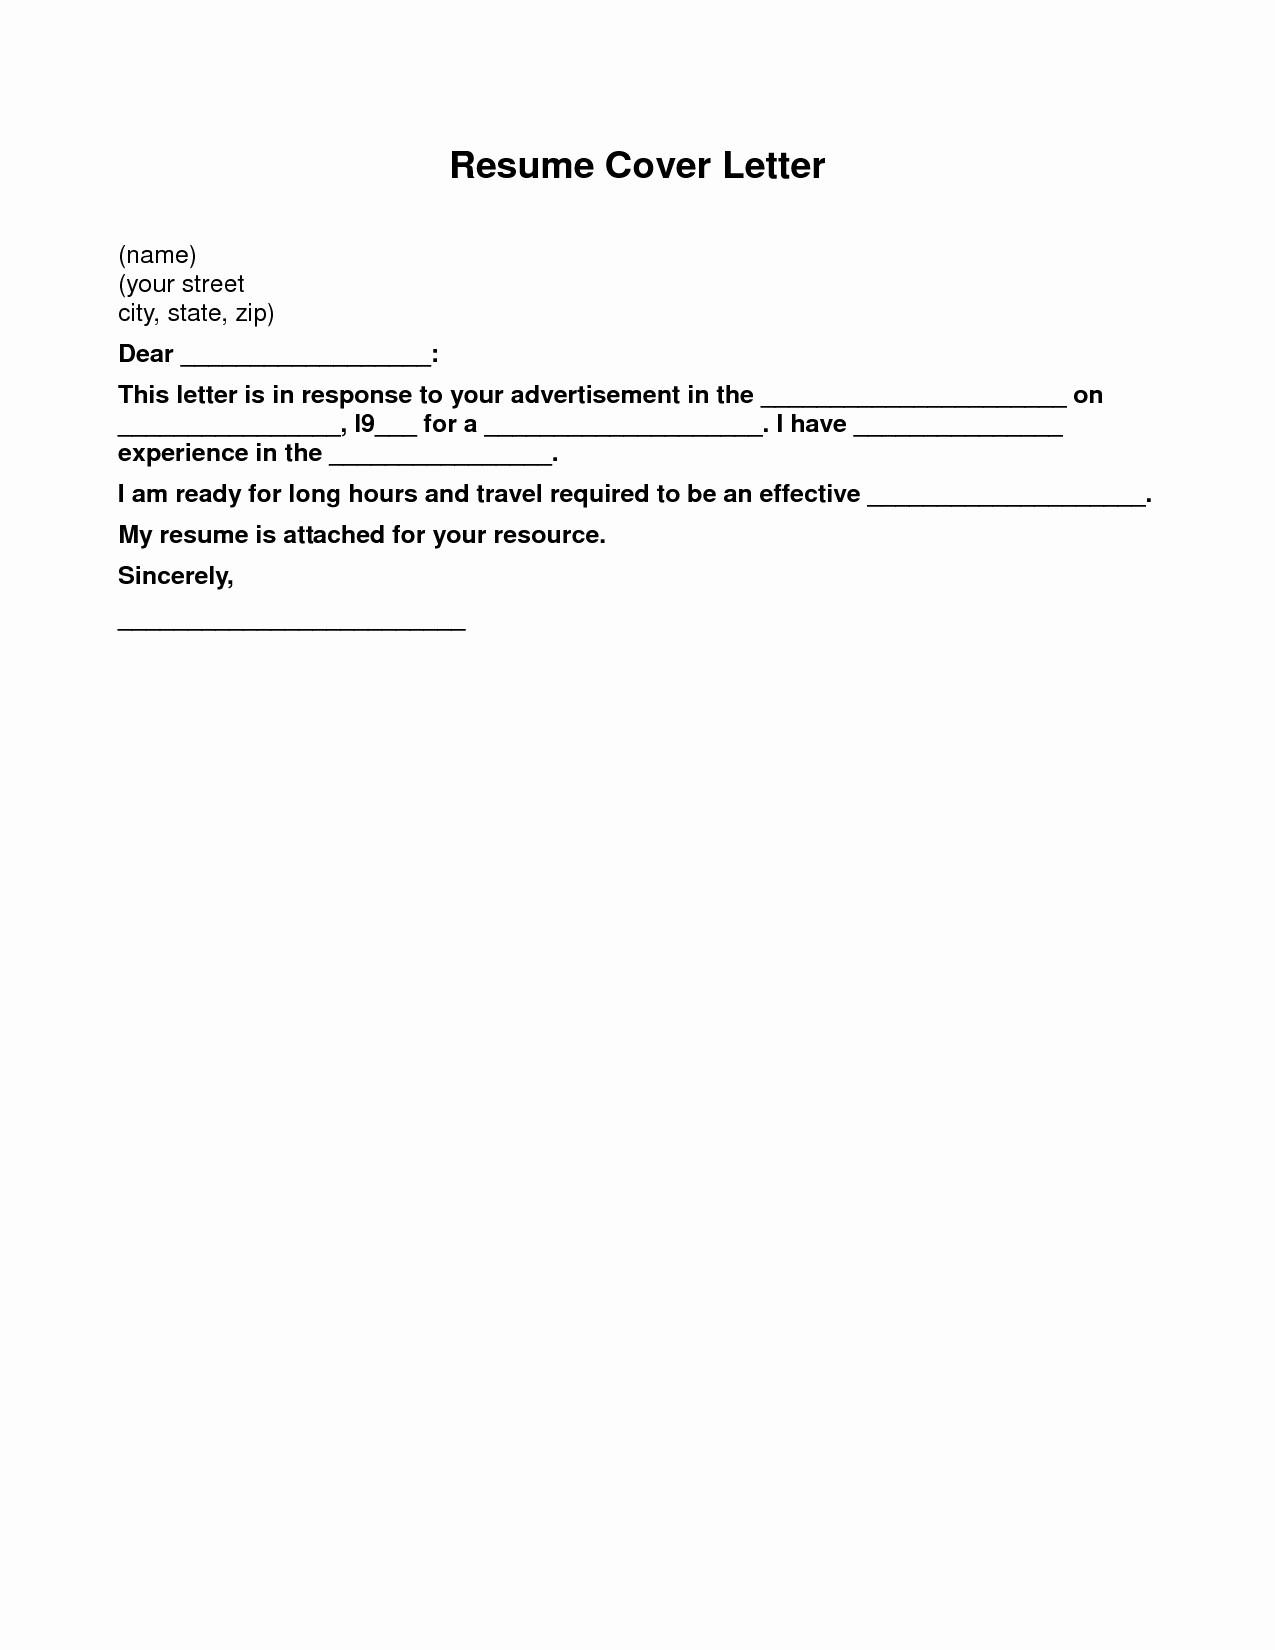 Simple Resume Cover Letter Examples Lovely Basic Cover Letter for A Resume